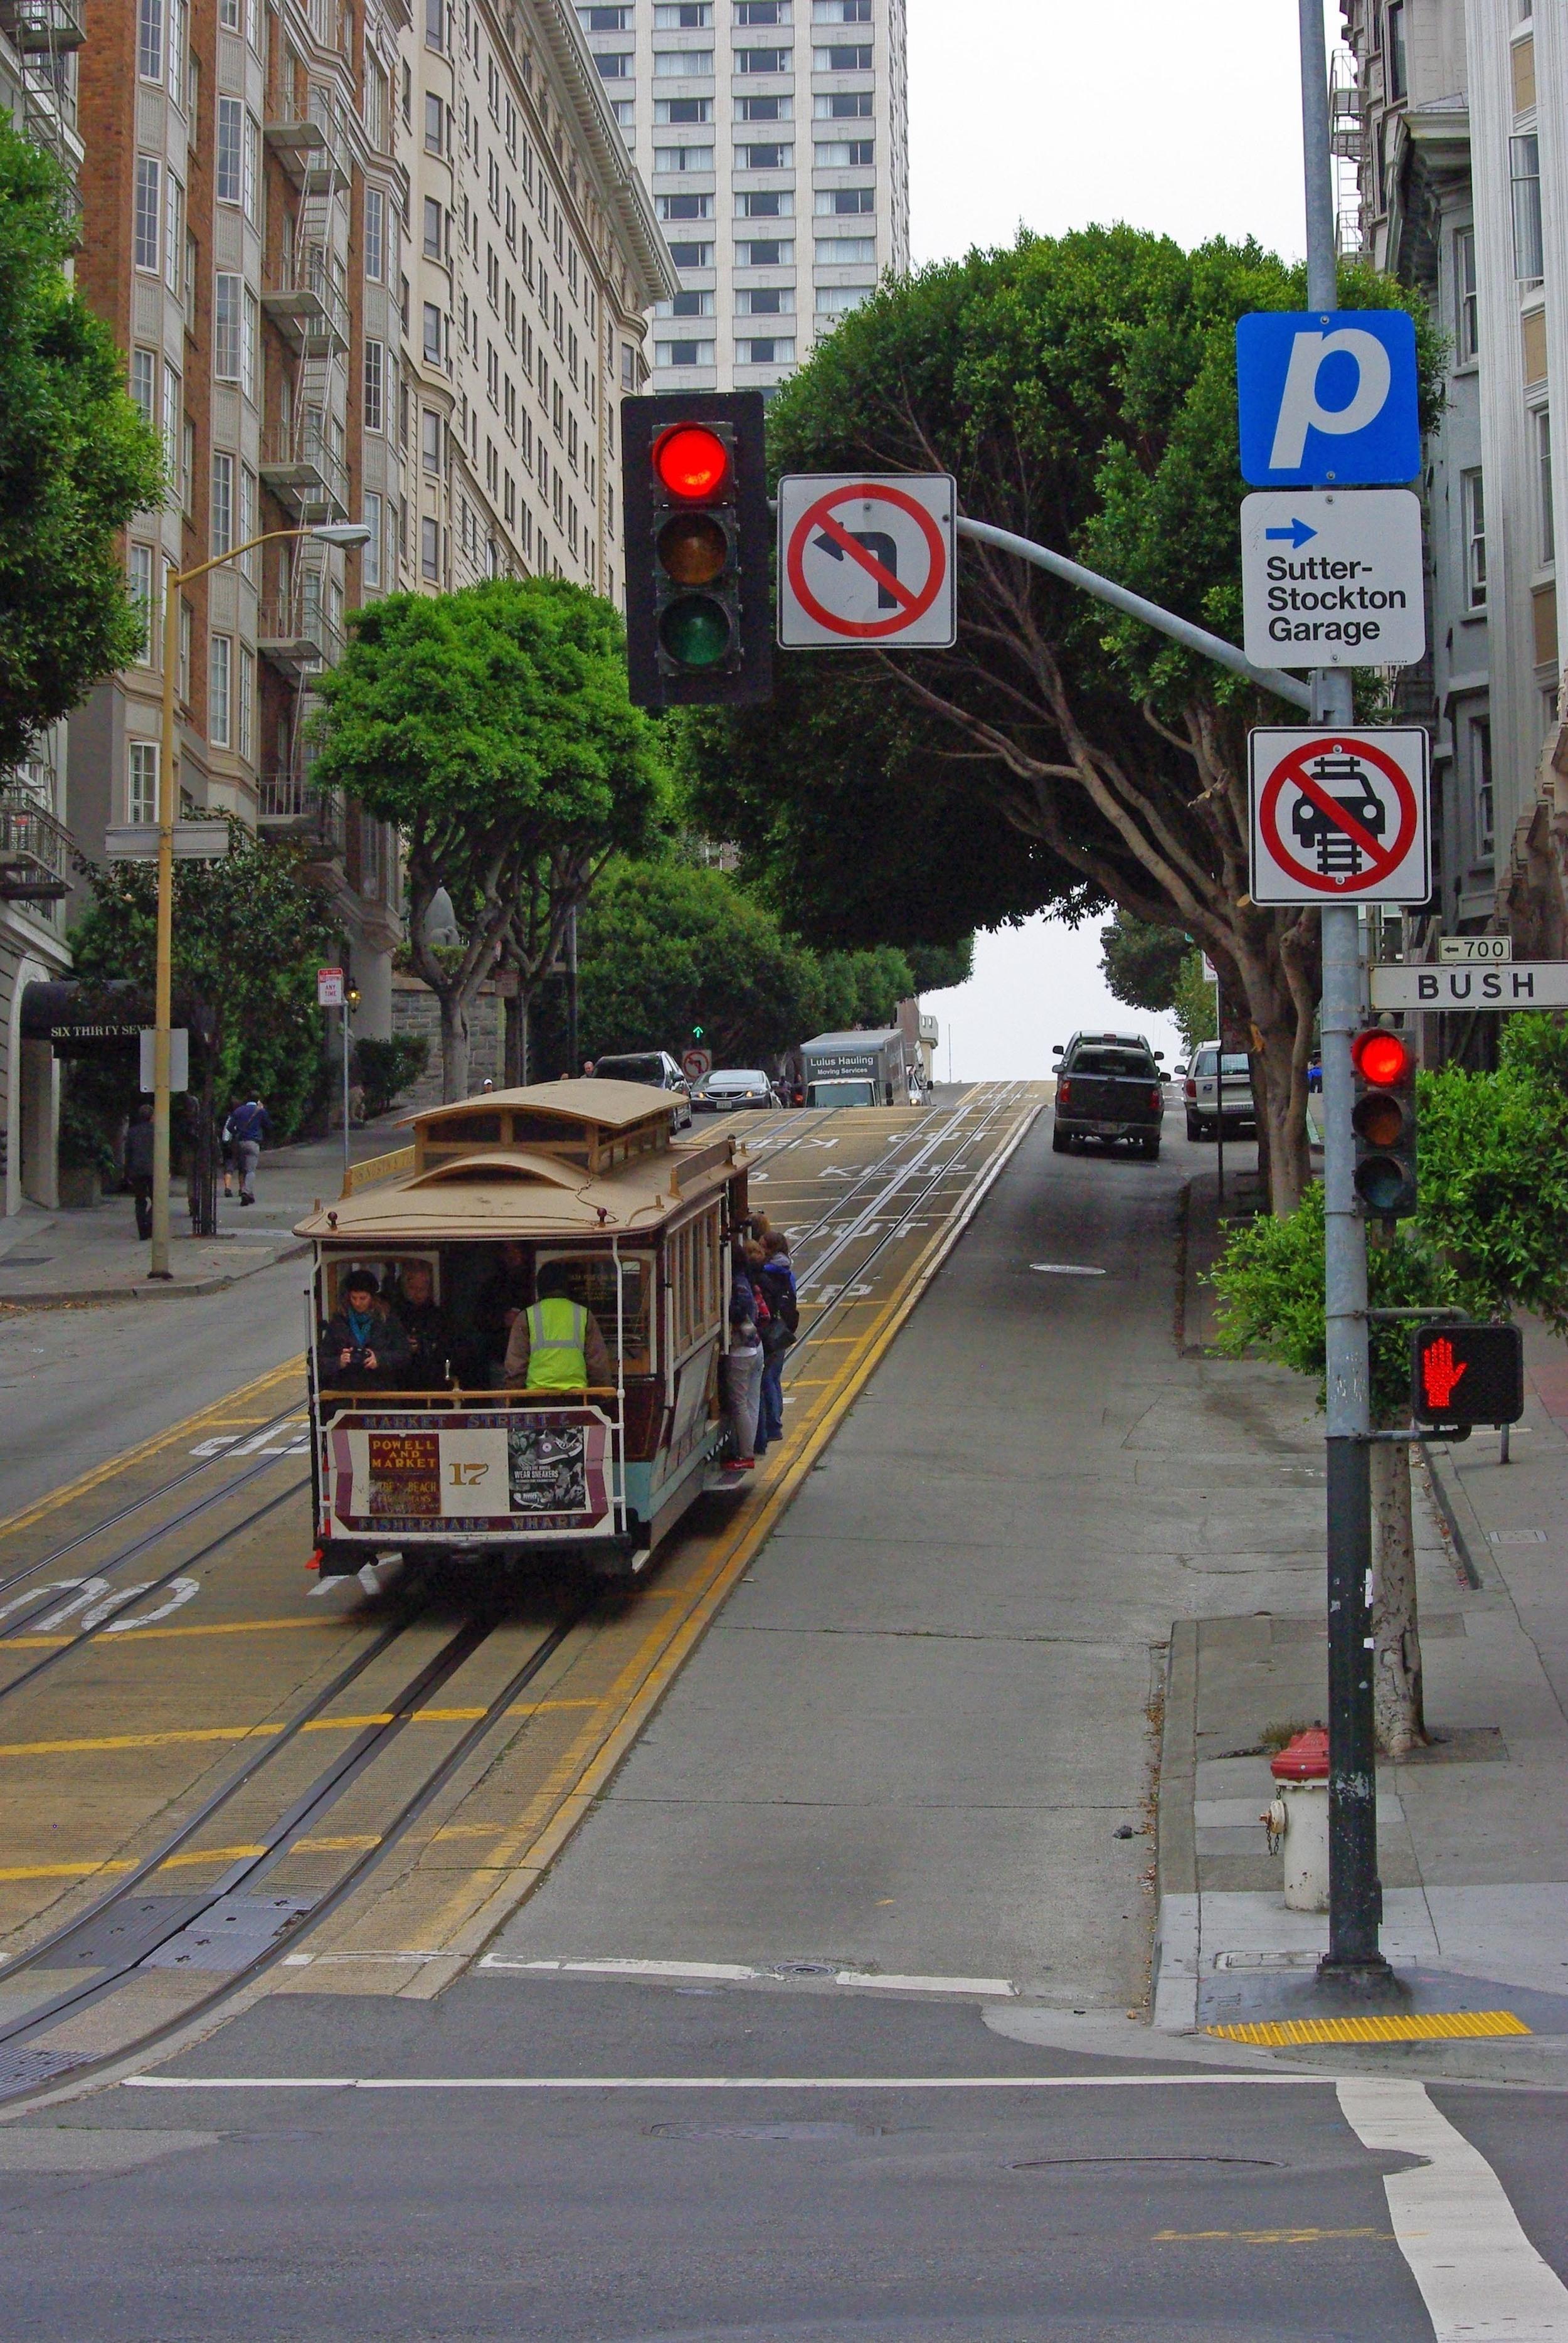 2.Ride a vintage cable car